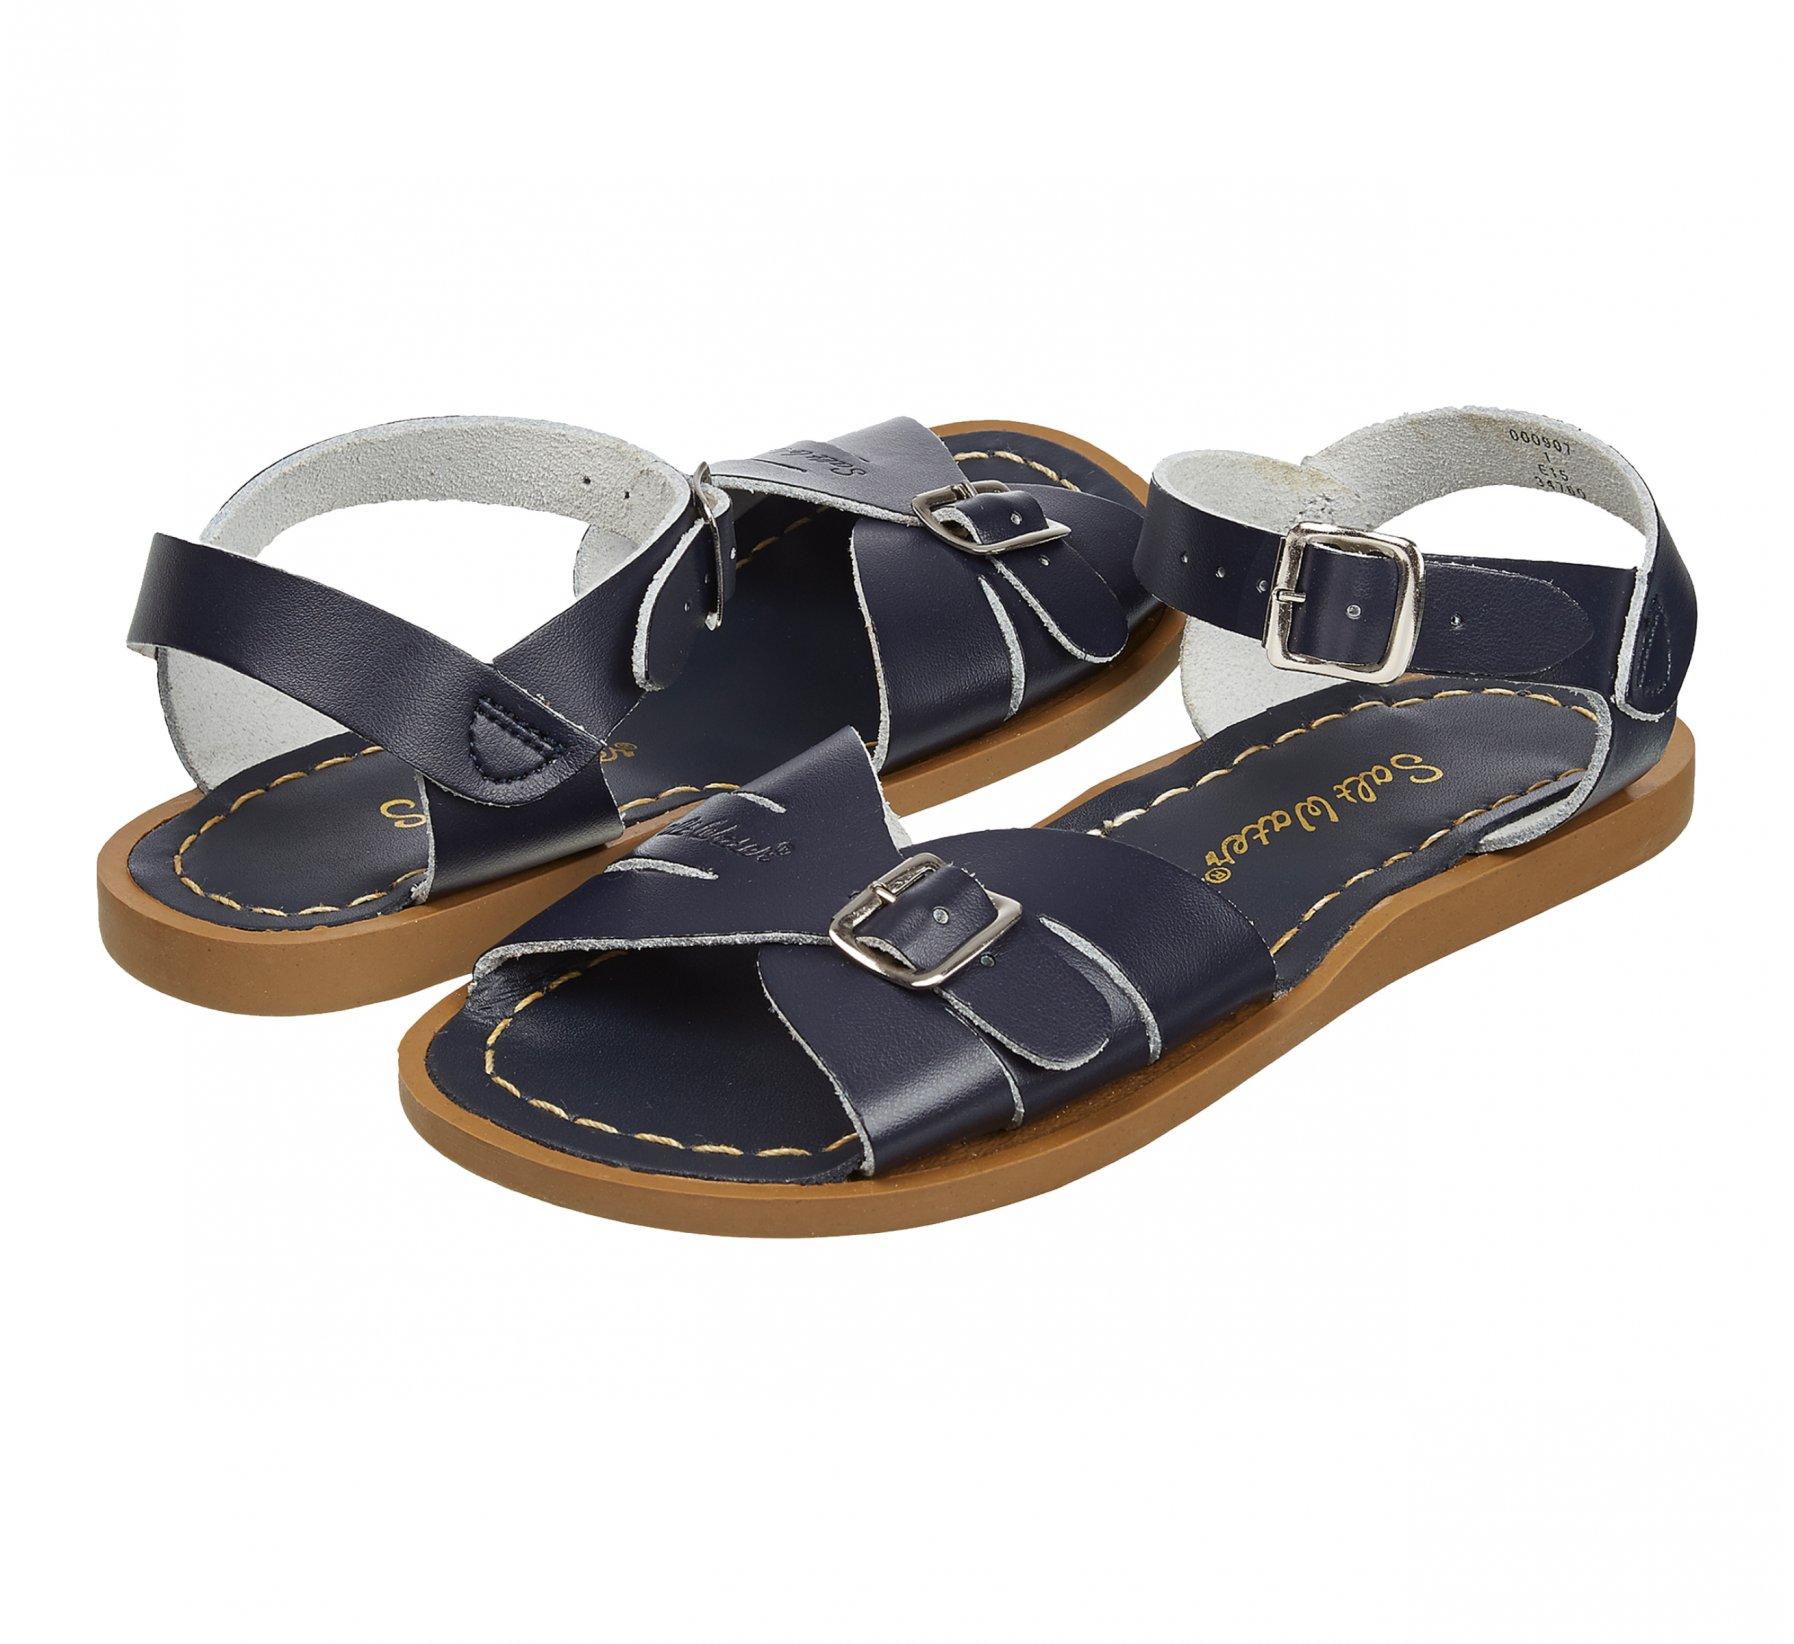 Classic Biru Kelasi  - Salt Water Sandals